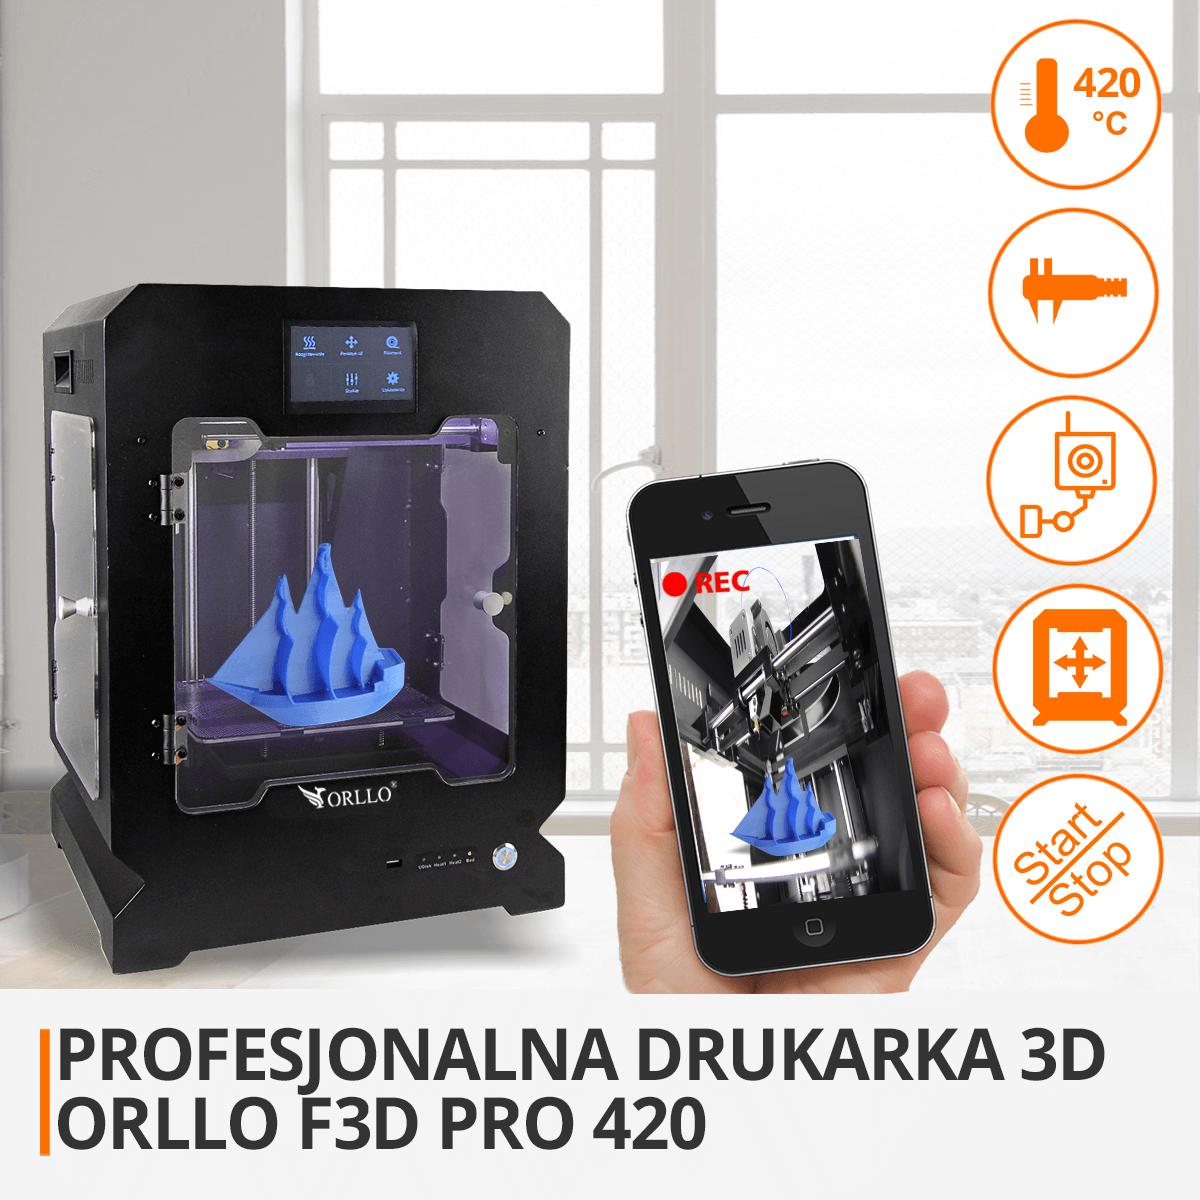 drukarka3d do zastosowania profesjonalnego orllo-pl